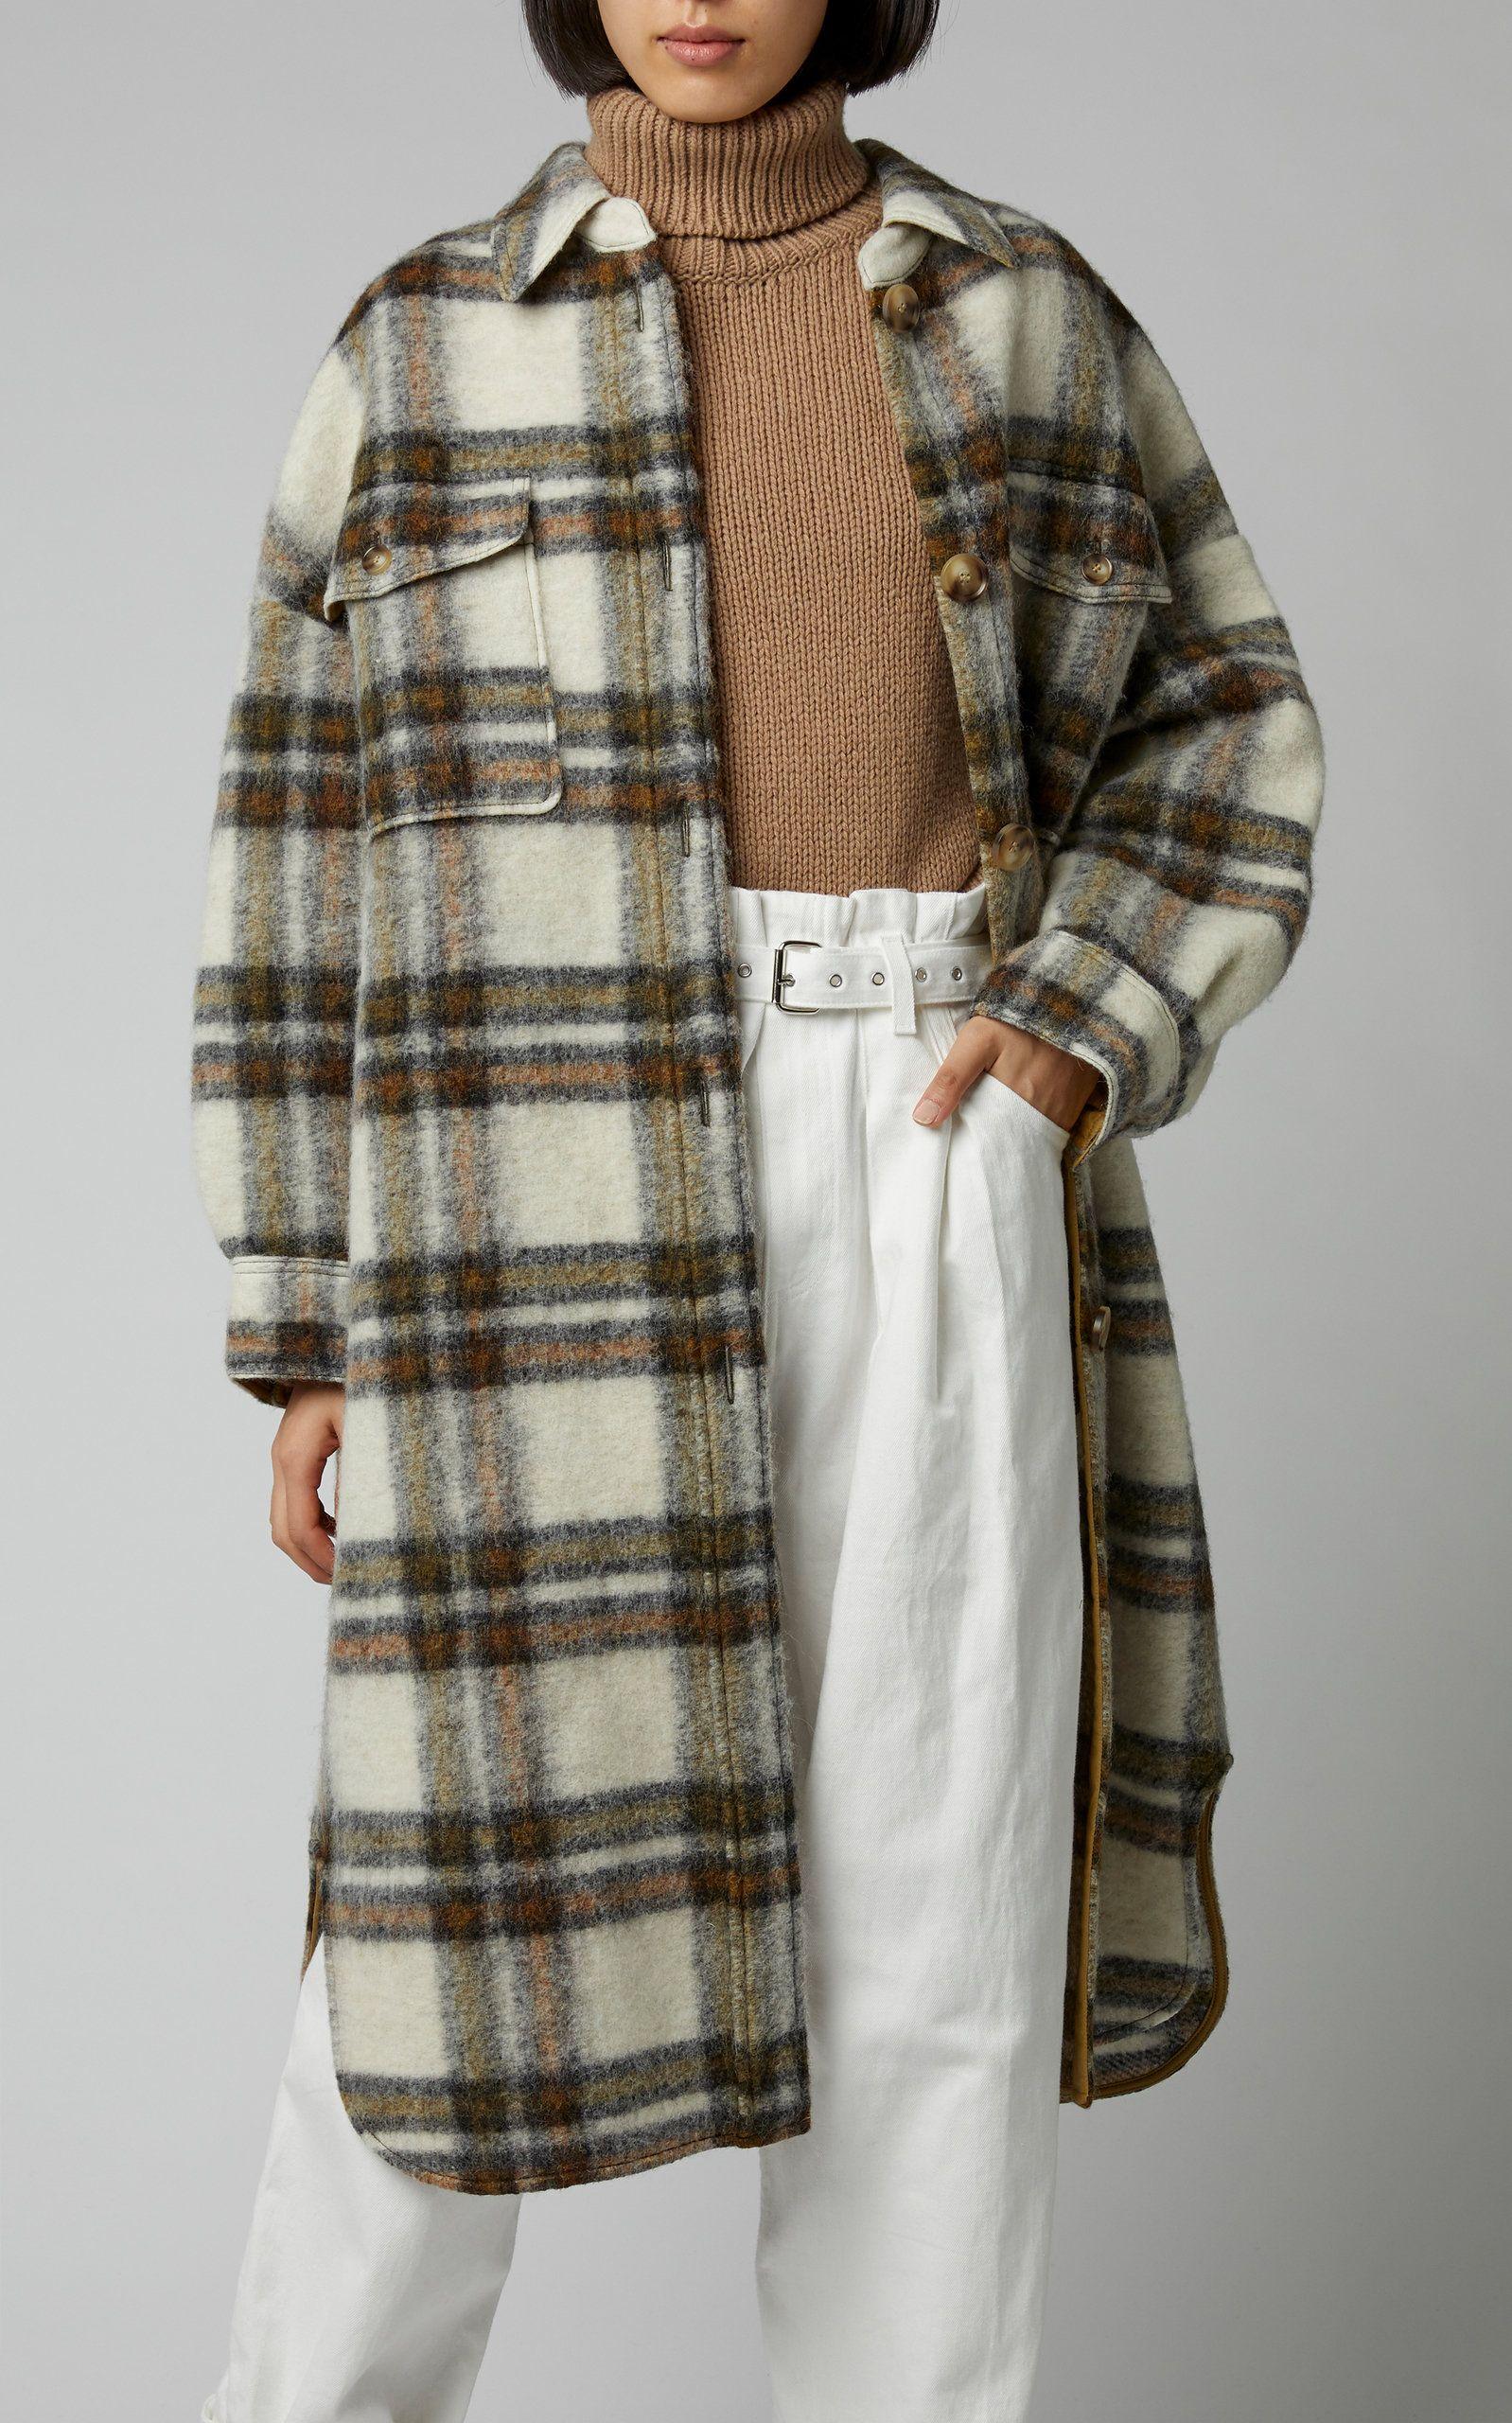 Isabel Marant Etoile Gabrion Checked Brushed Wool Blend Coat Winter Fashion Outfits Coat Women Fashion Outerwear Fashion [ 2560 x 1598 Pixel ]